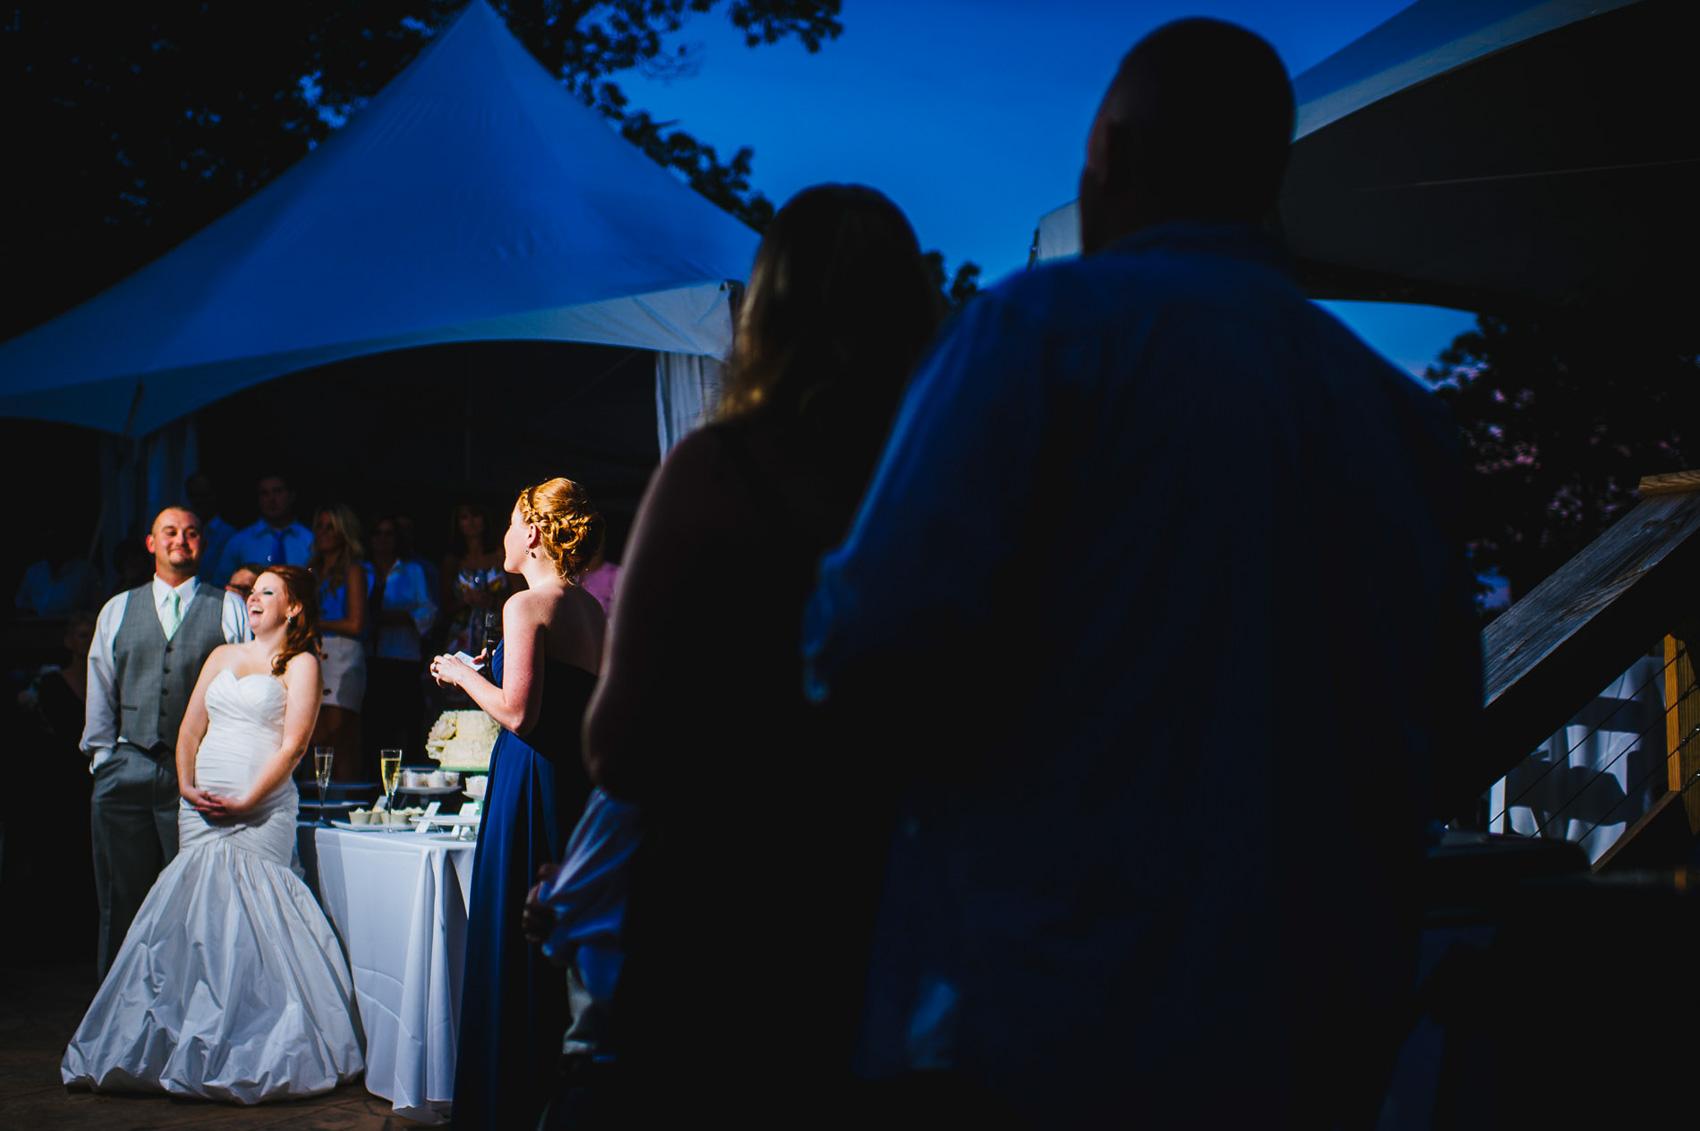 065-oberports-wedding-reception-portfolio